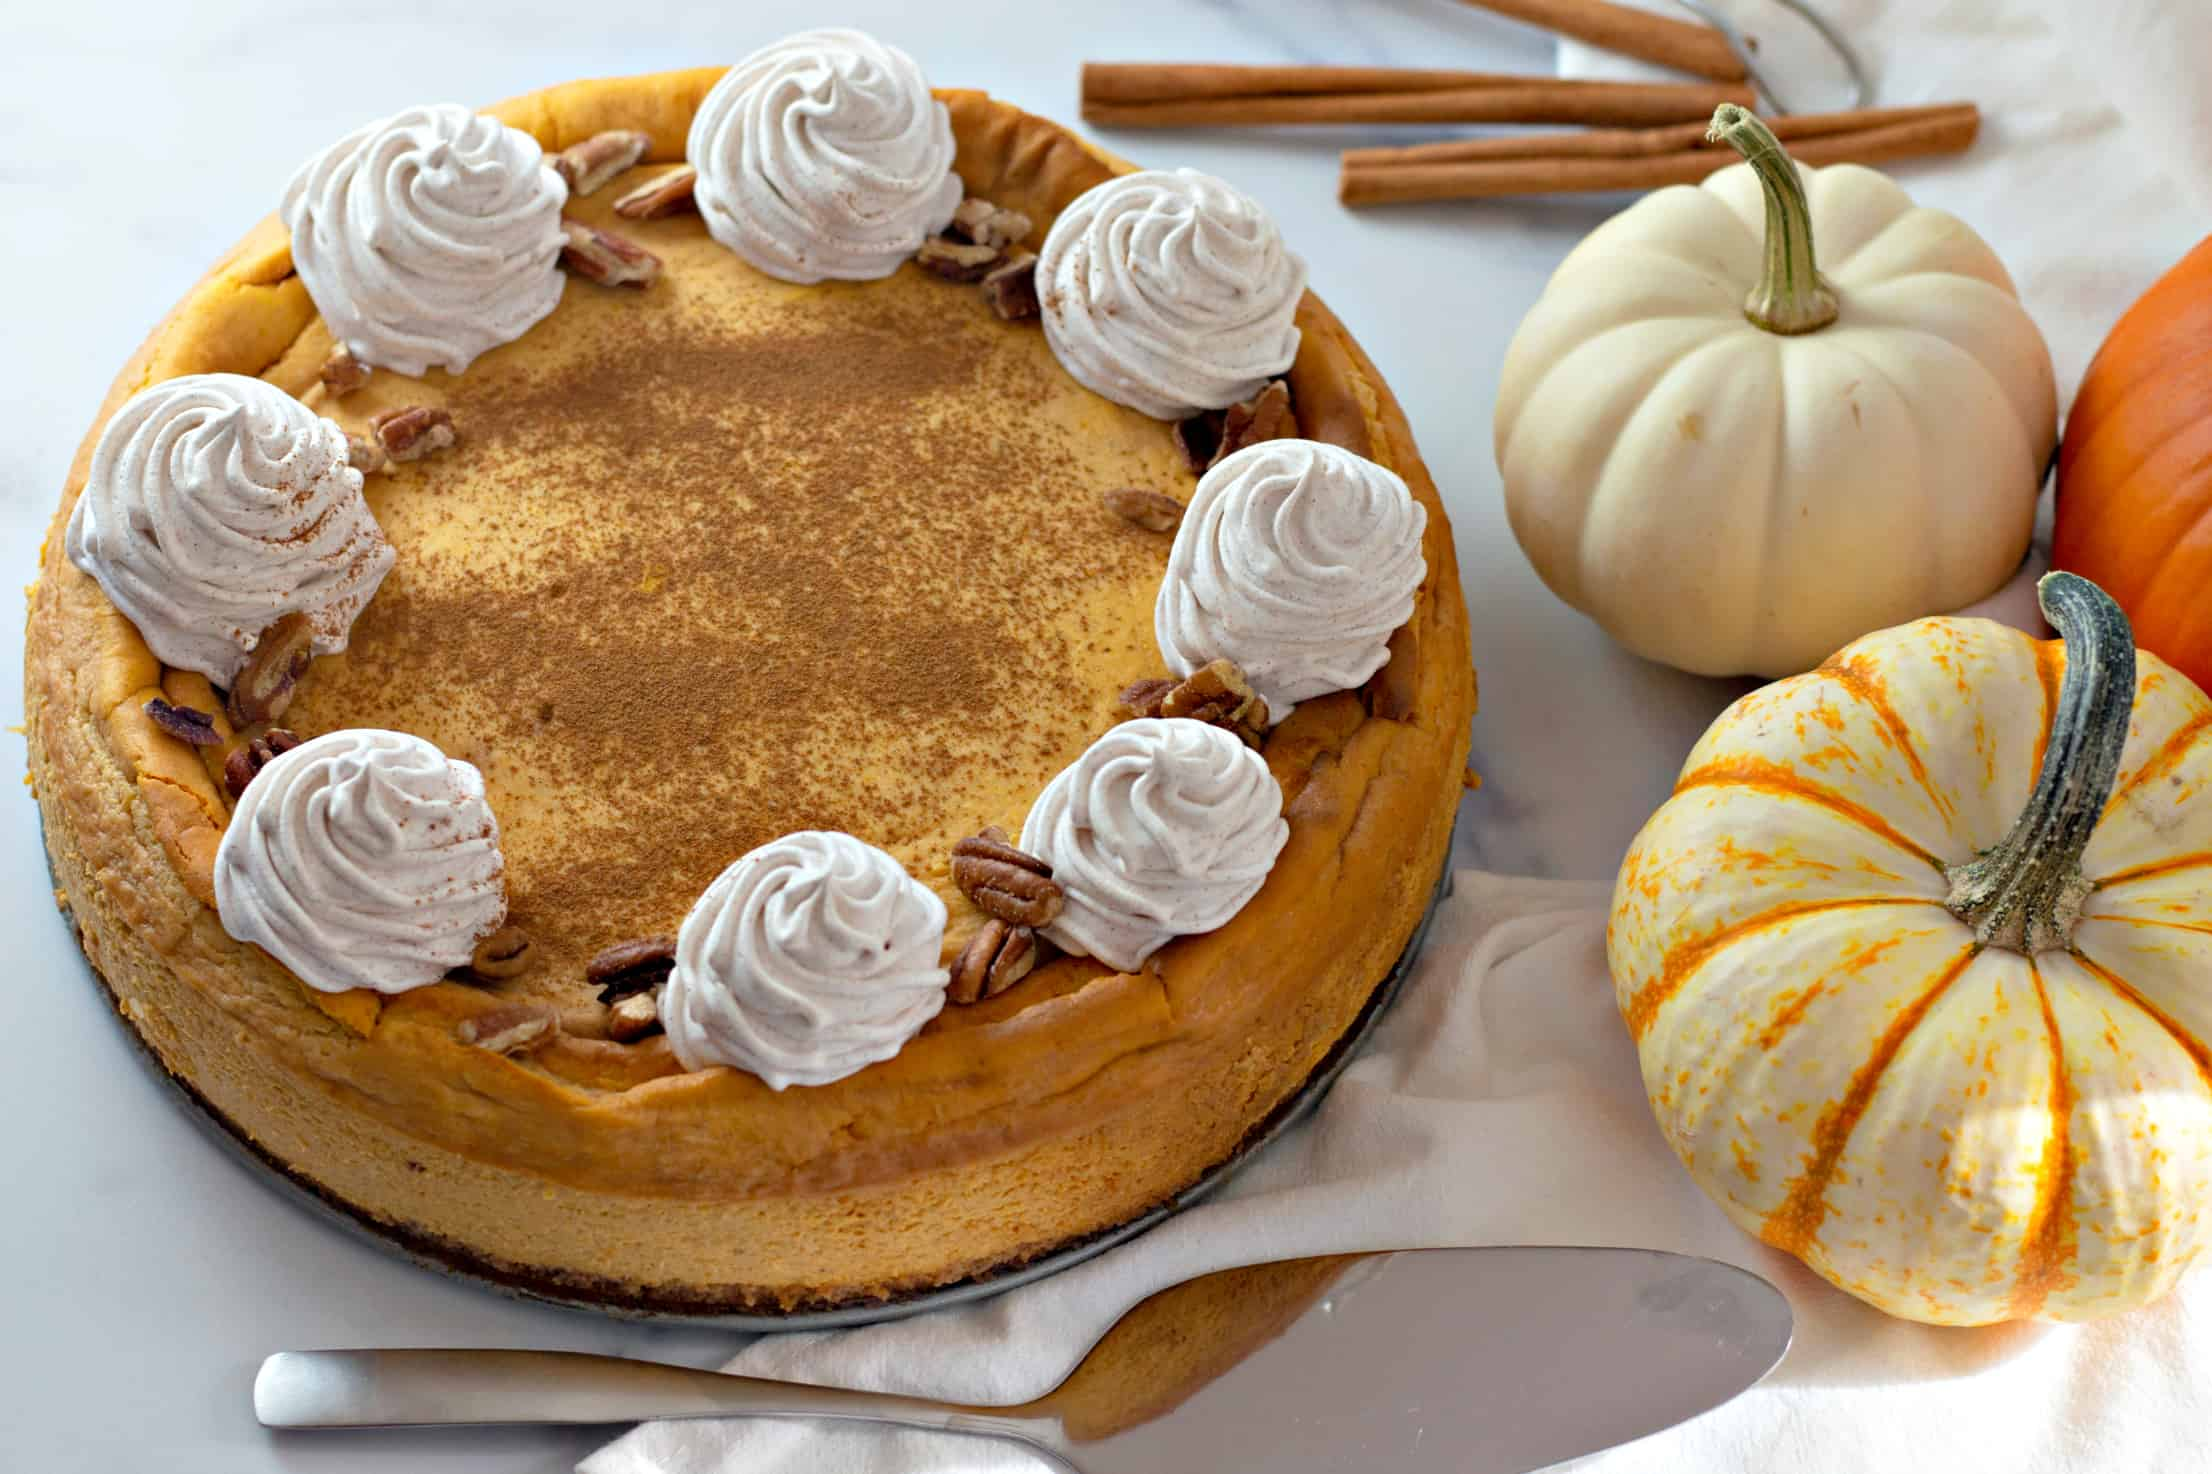 keto pumpkin cheesecake on white counter with mini pumpkins